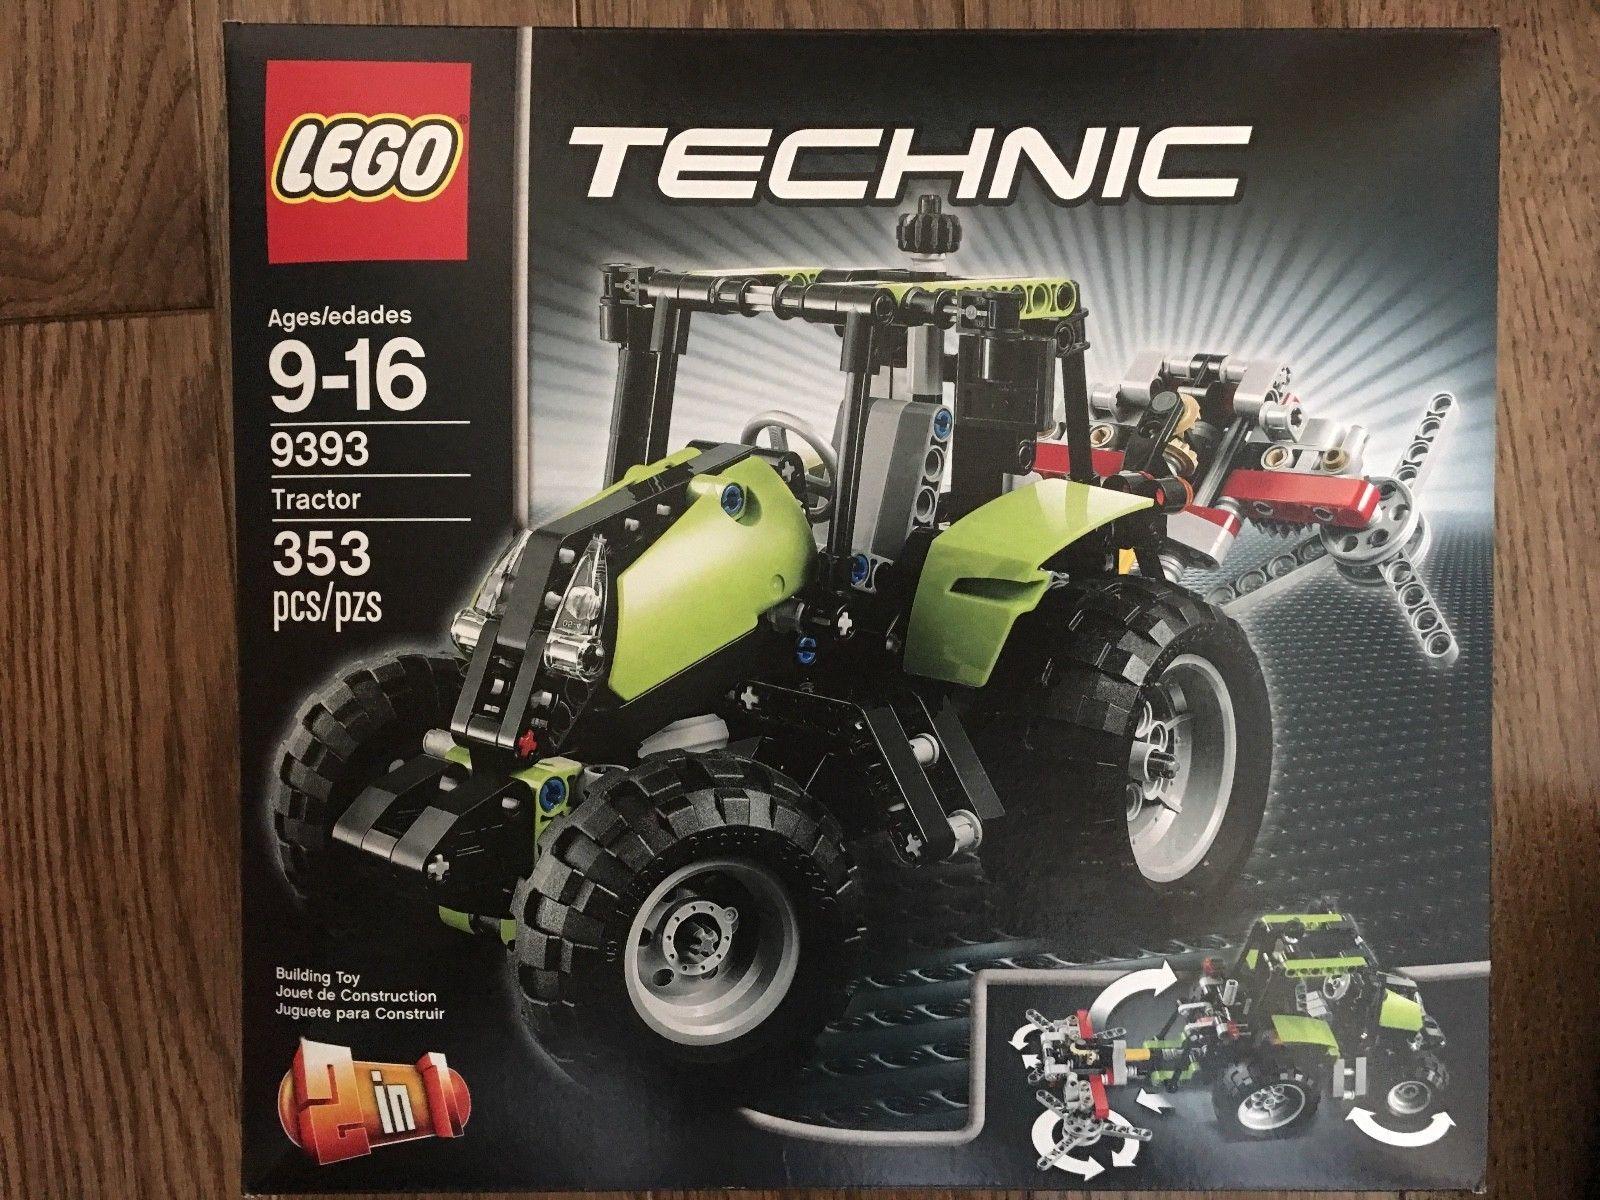 Sealed 9393 Lego Newamp; RetiredTractor Tractor zUMqVSp